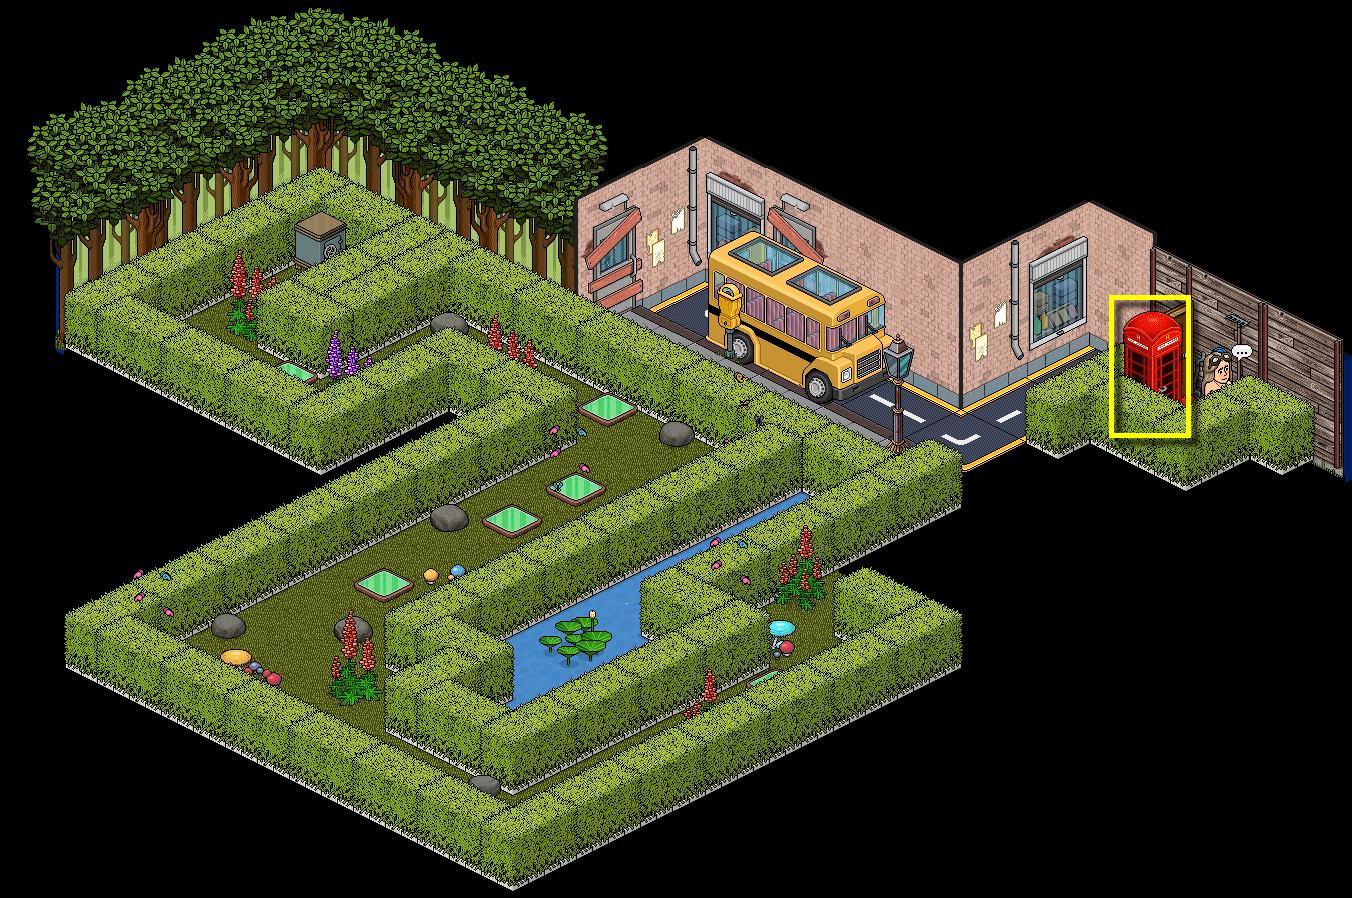 [Aventure] Dans le jardin